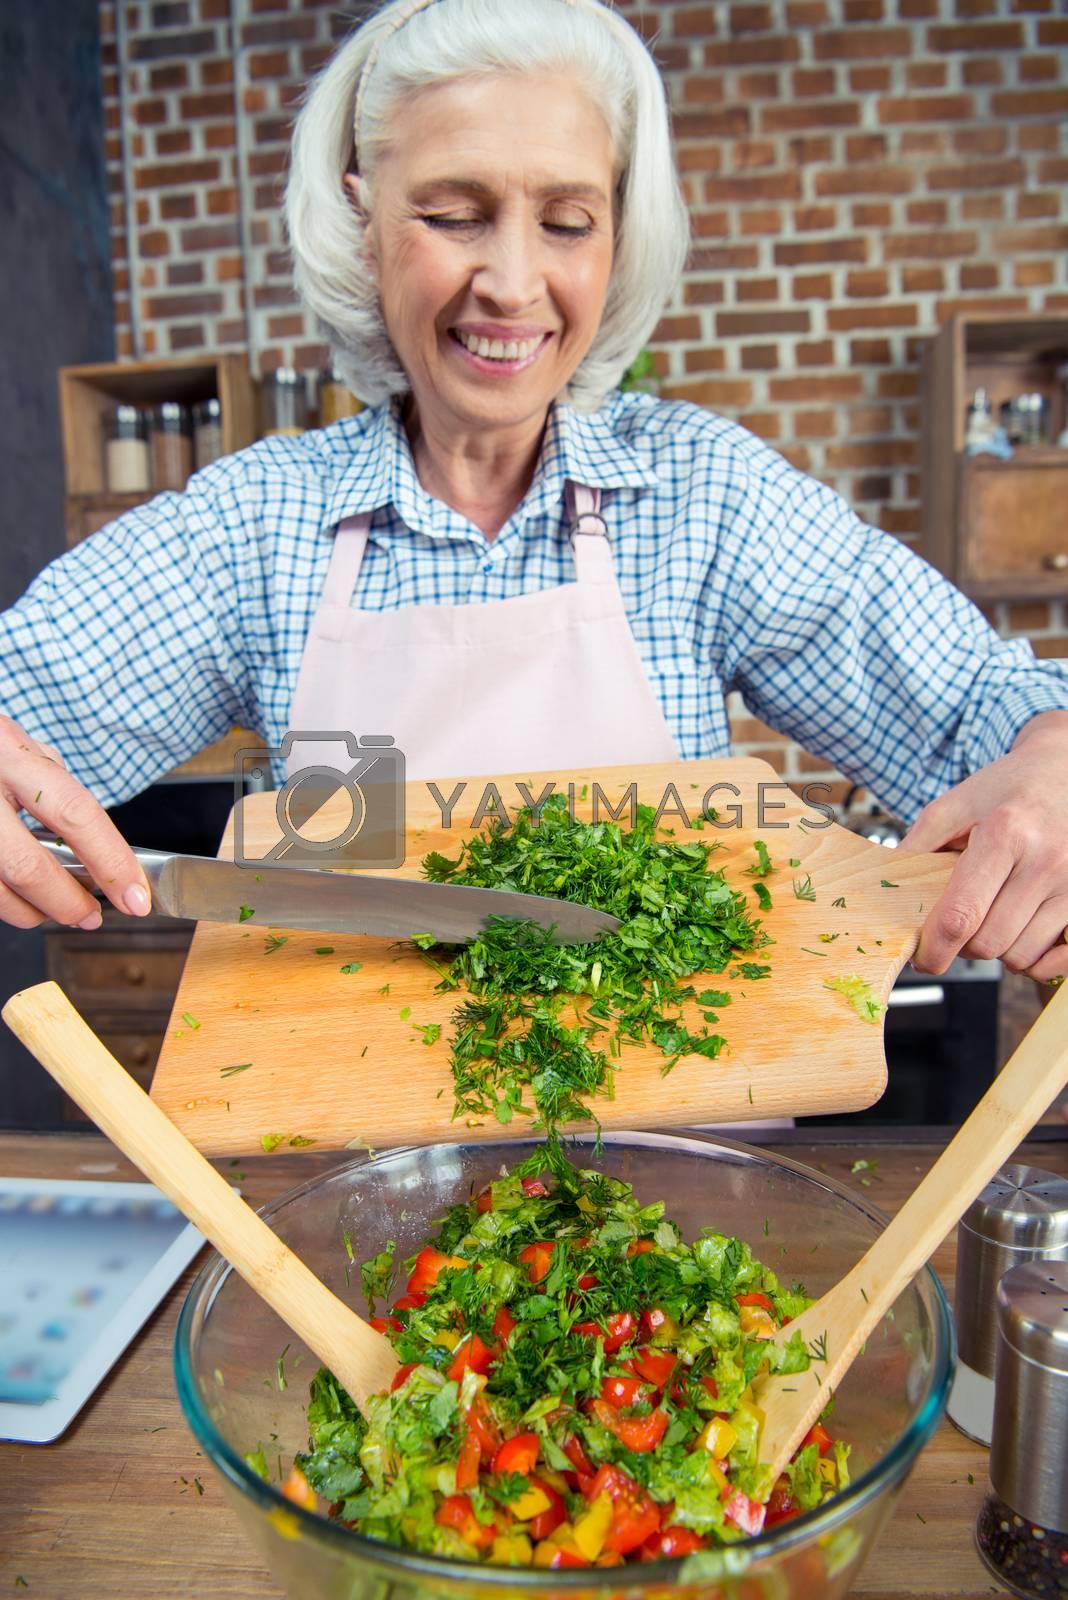 Smiling senior woman cutting salad greens